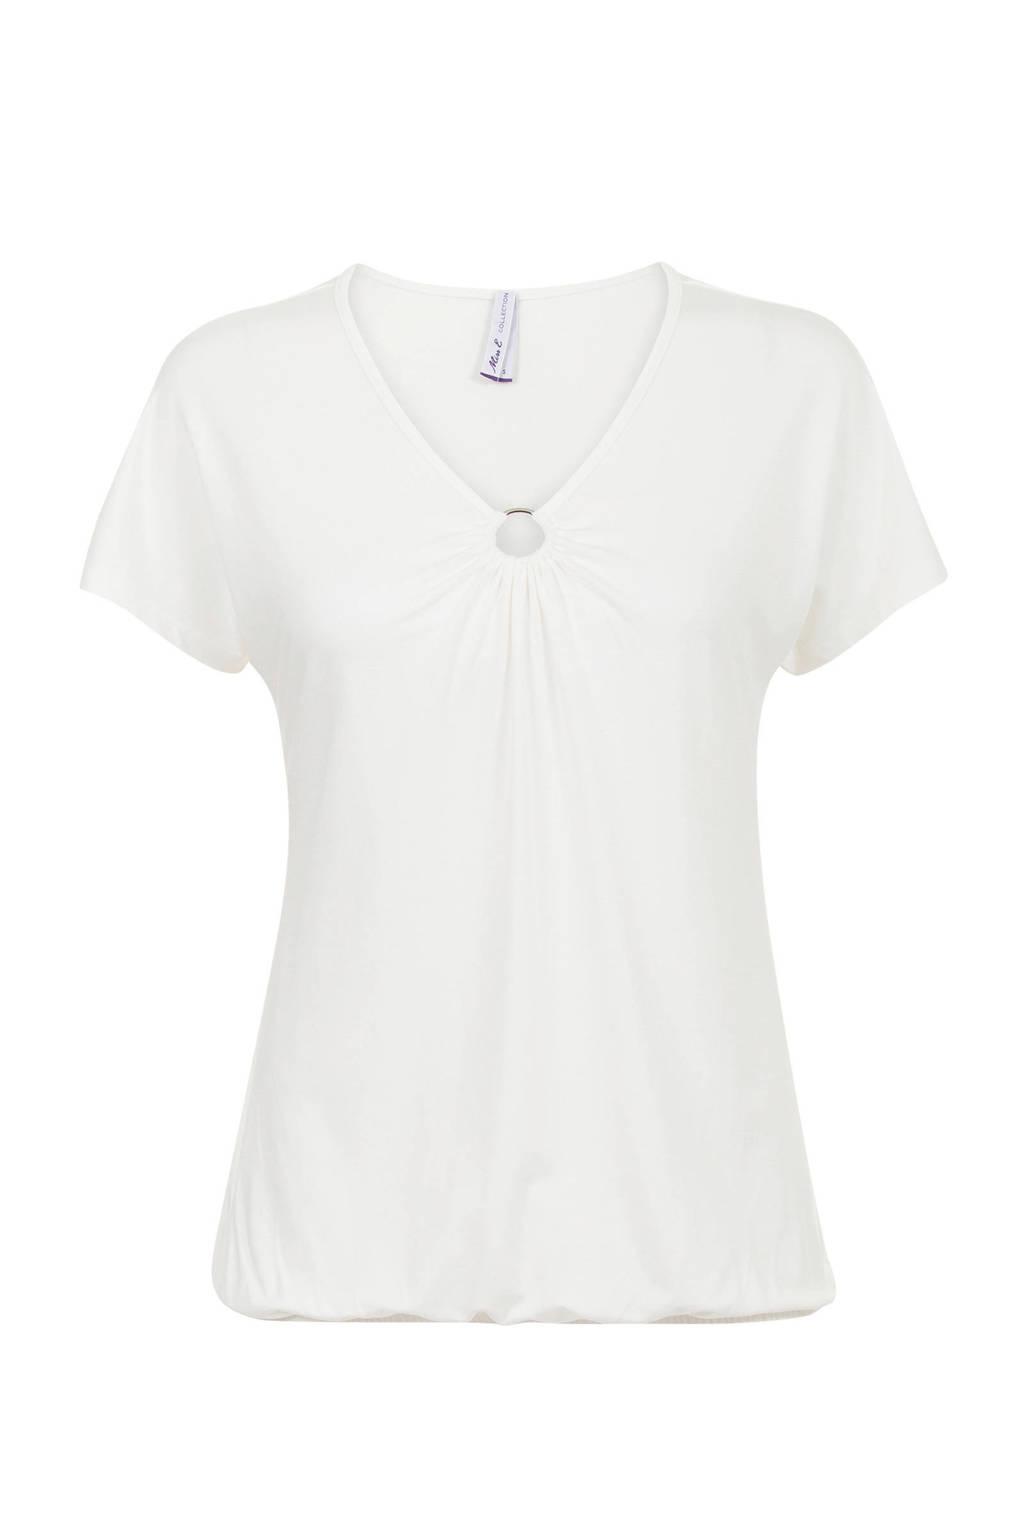 Miss Etam Regulier T-shirt met ring detail, Ecru